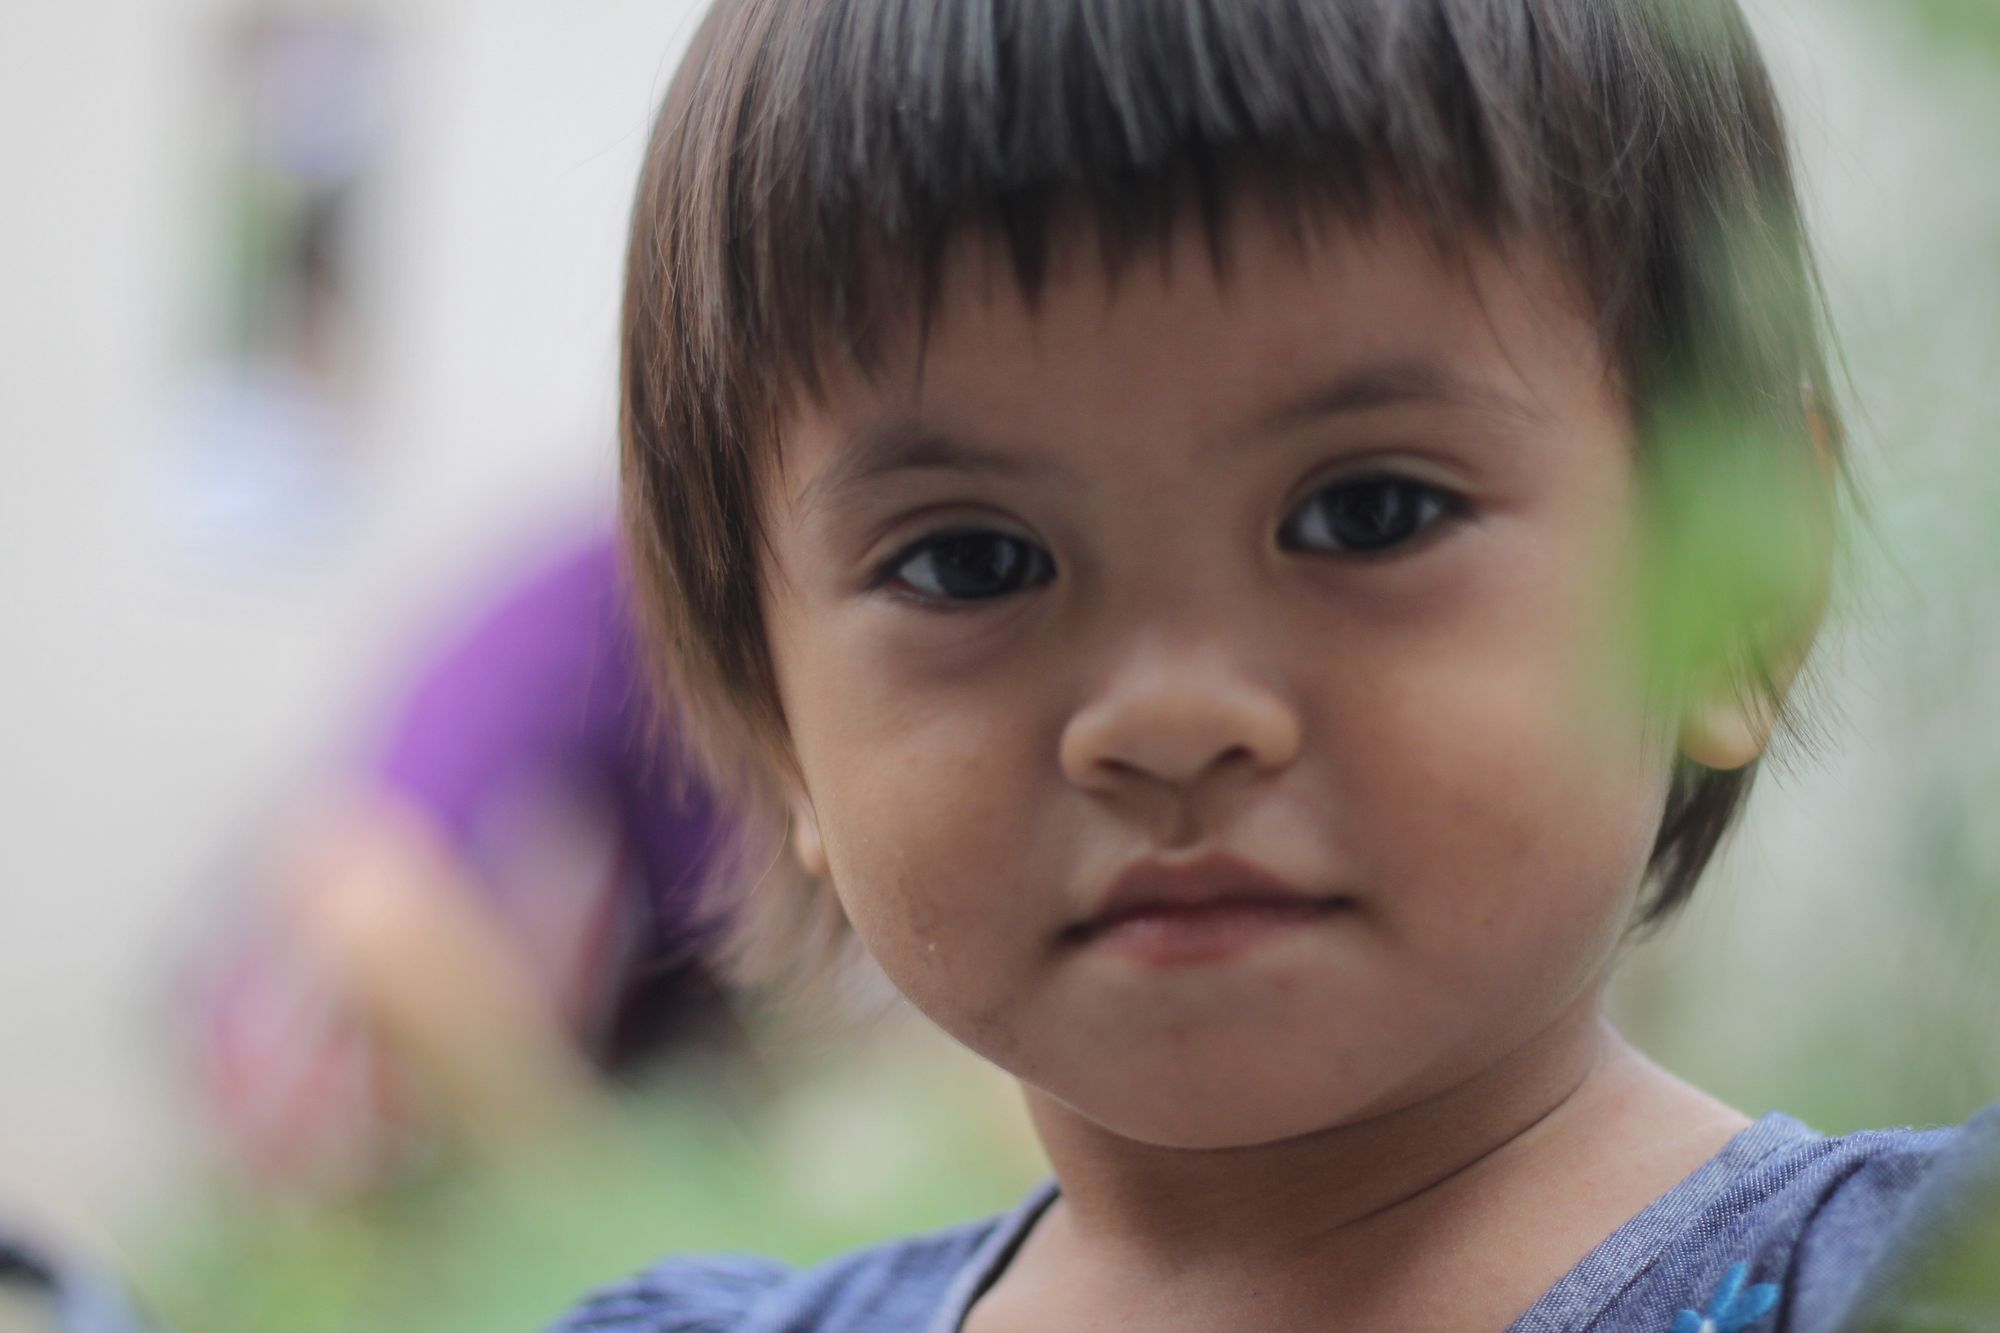 Pua-pua Dede dan Doa untuk Balita di Sulawesi Selatan